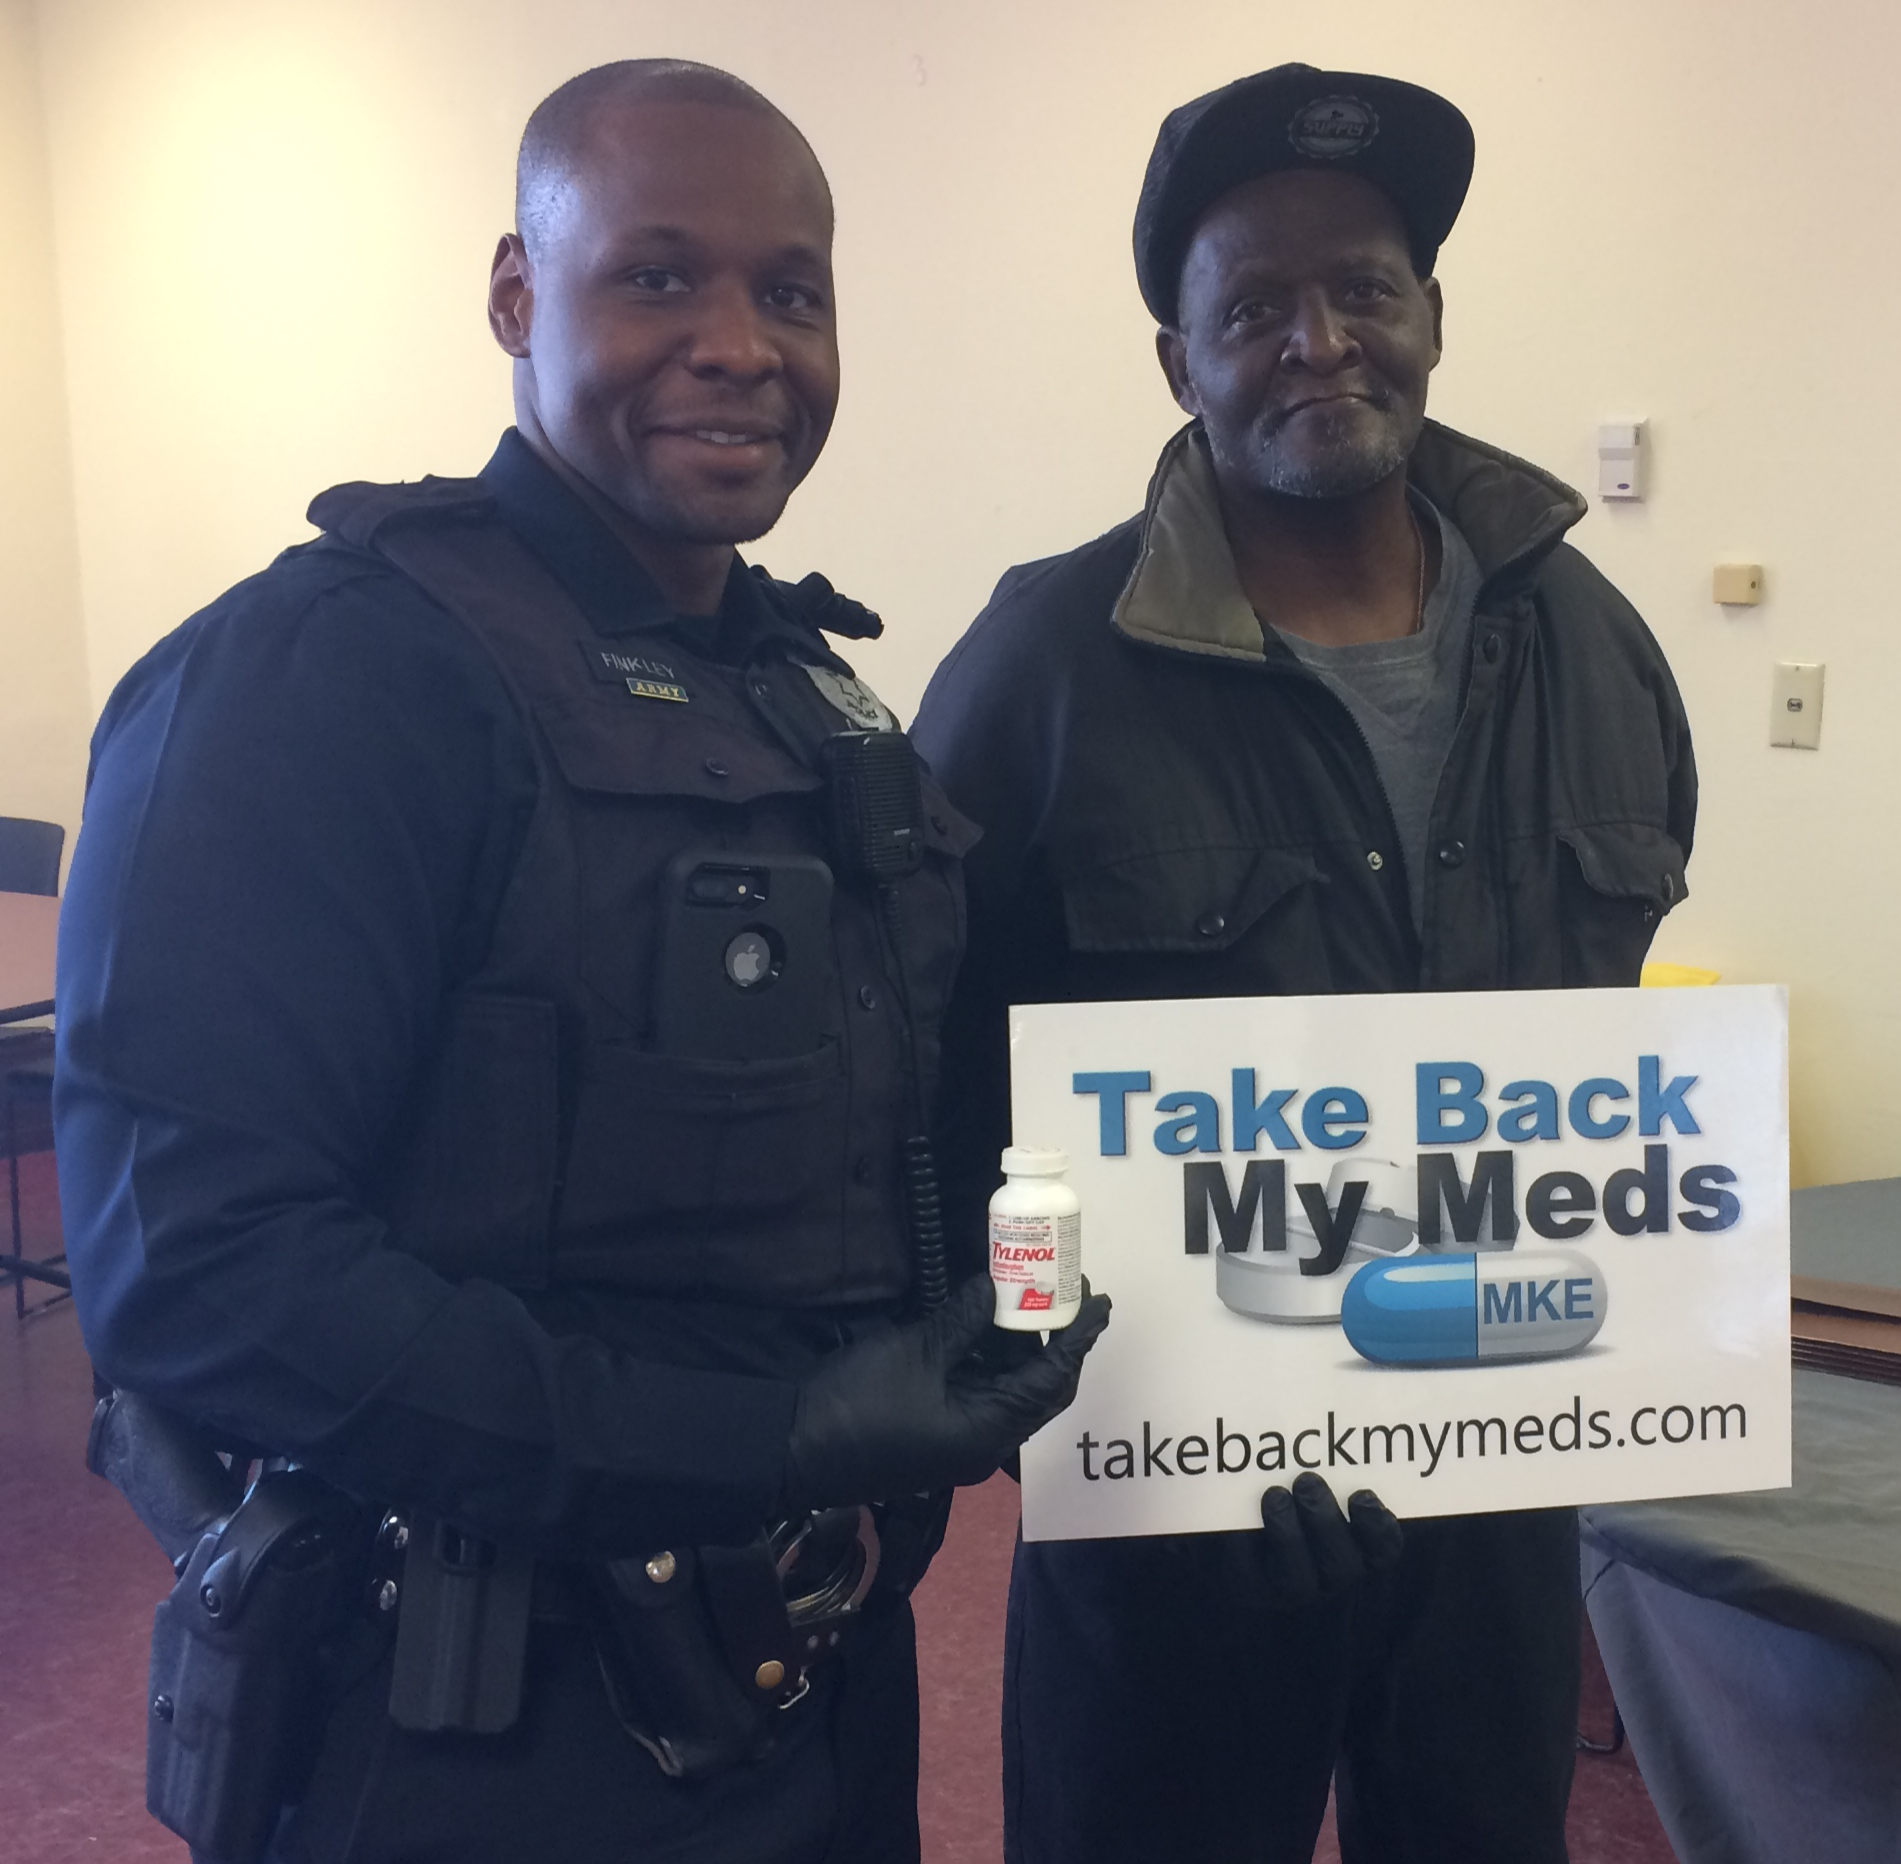 Spotlight On: Take Back My Meds MKE